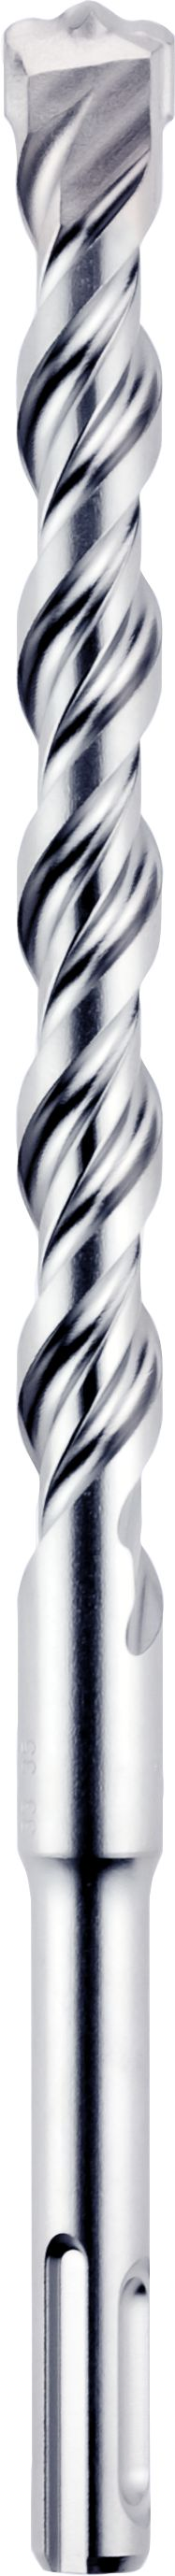 Slika BORER Rocket 3 SDS-plus 16x400 mm